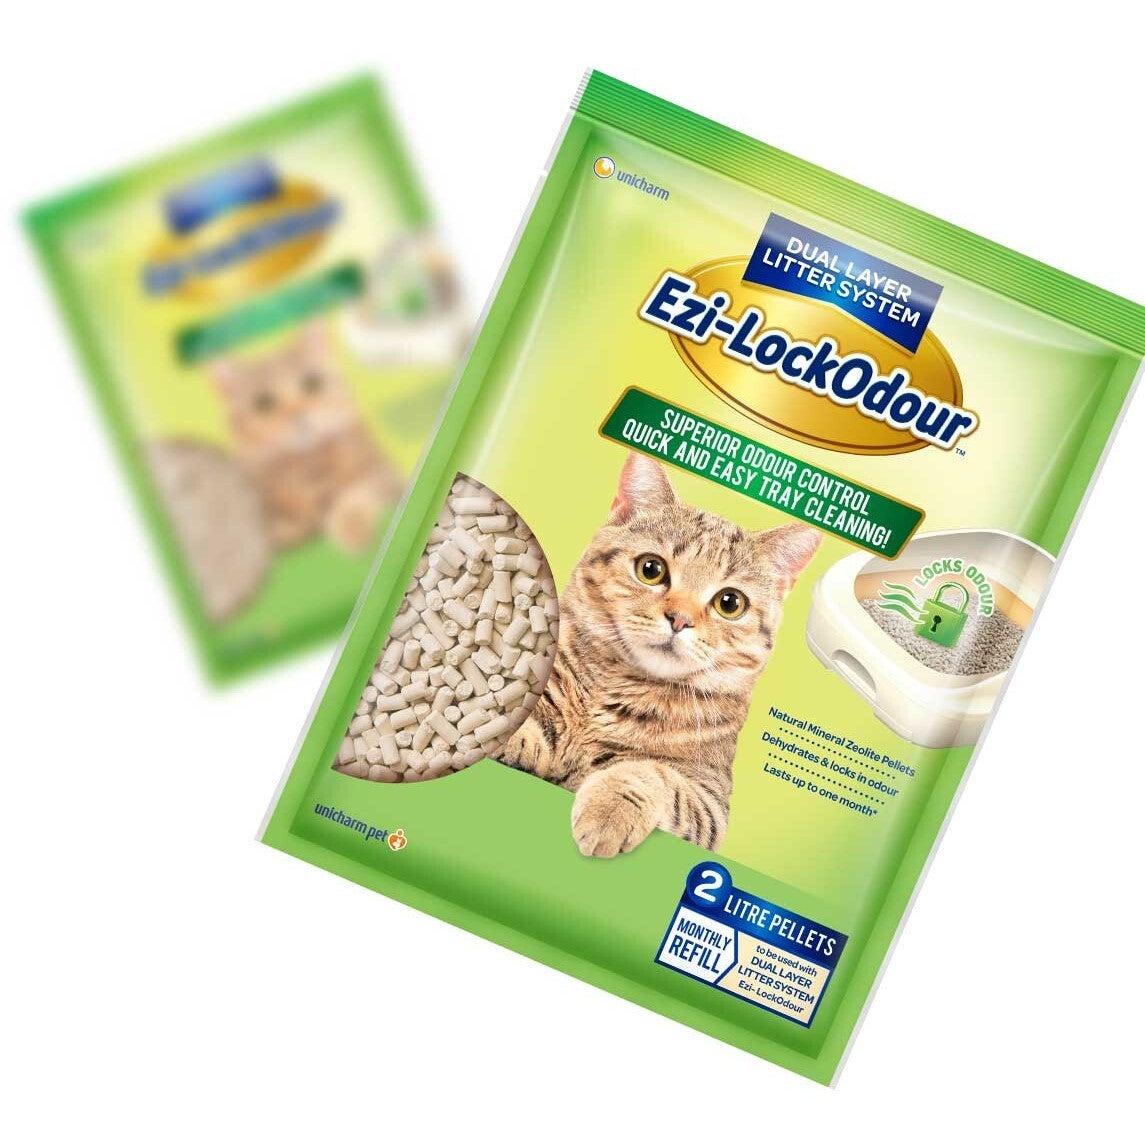 Ezi LockOdour Natural Mineral Zeolite Cat Litter Pellets 2kg